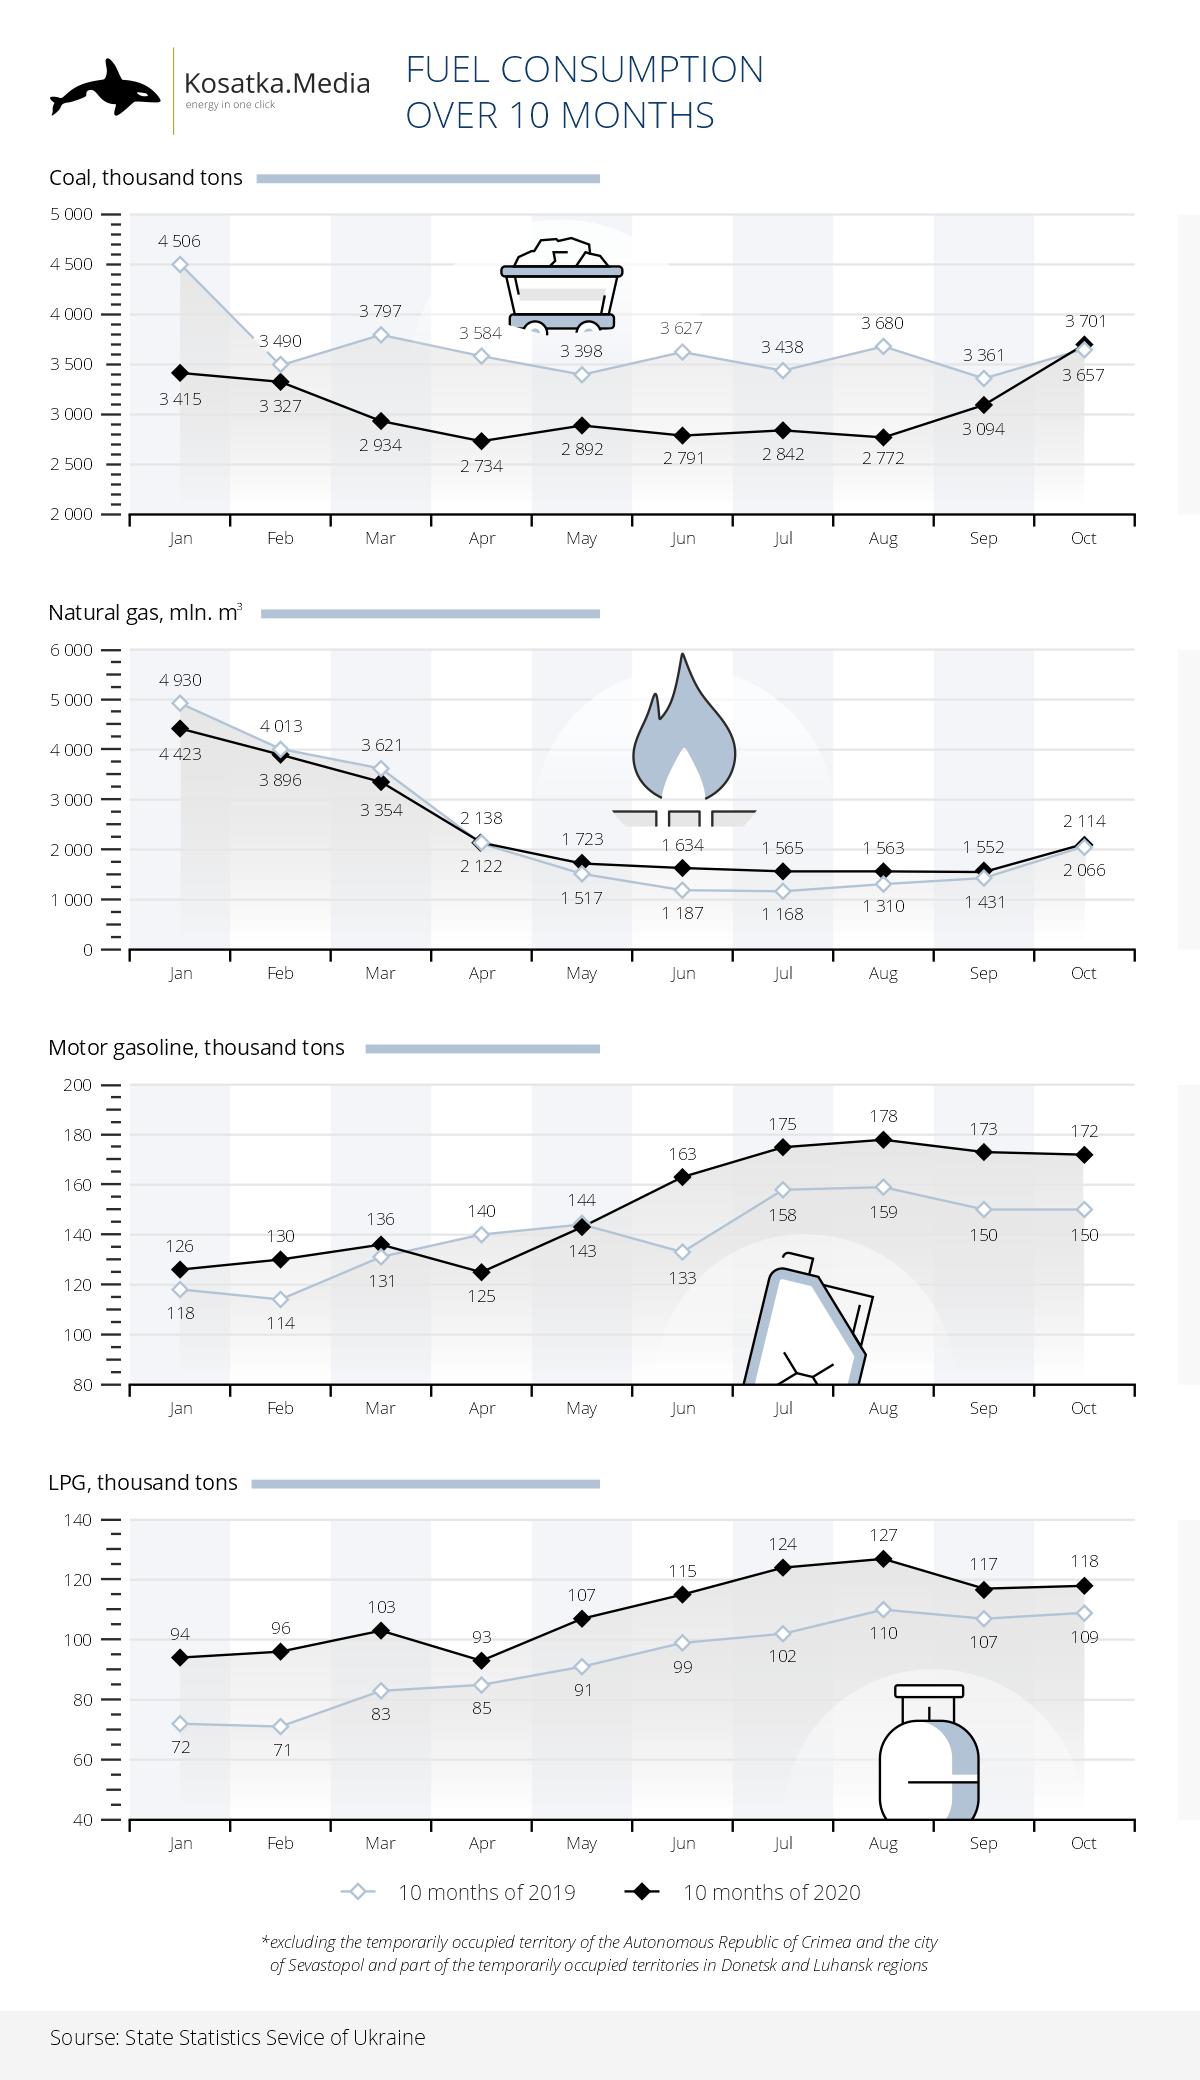 Ukraine reduced coal consumption and increased gasoline